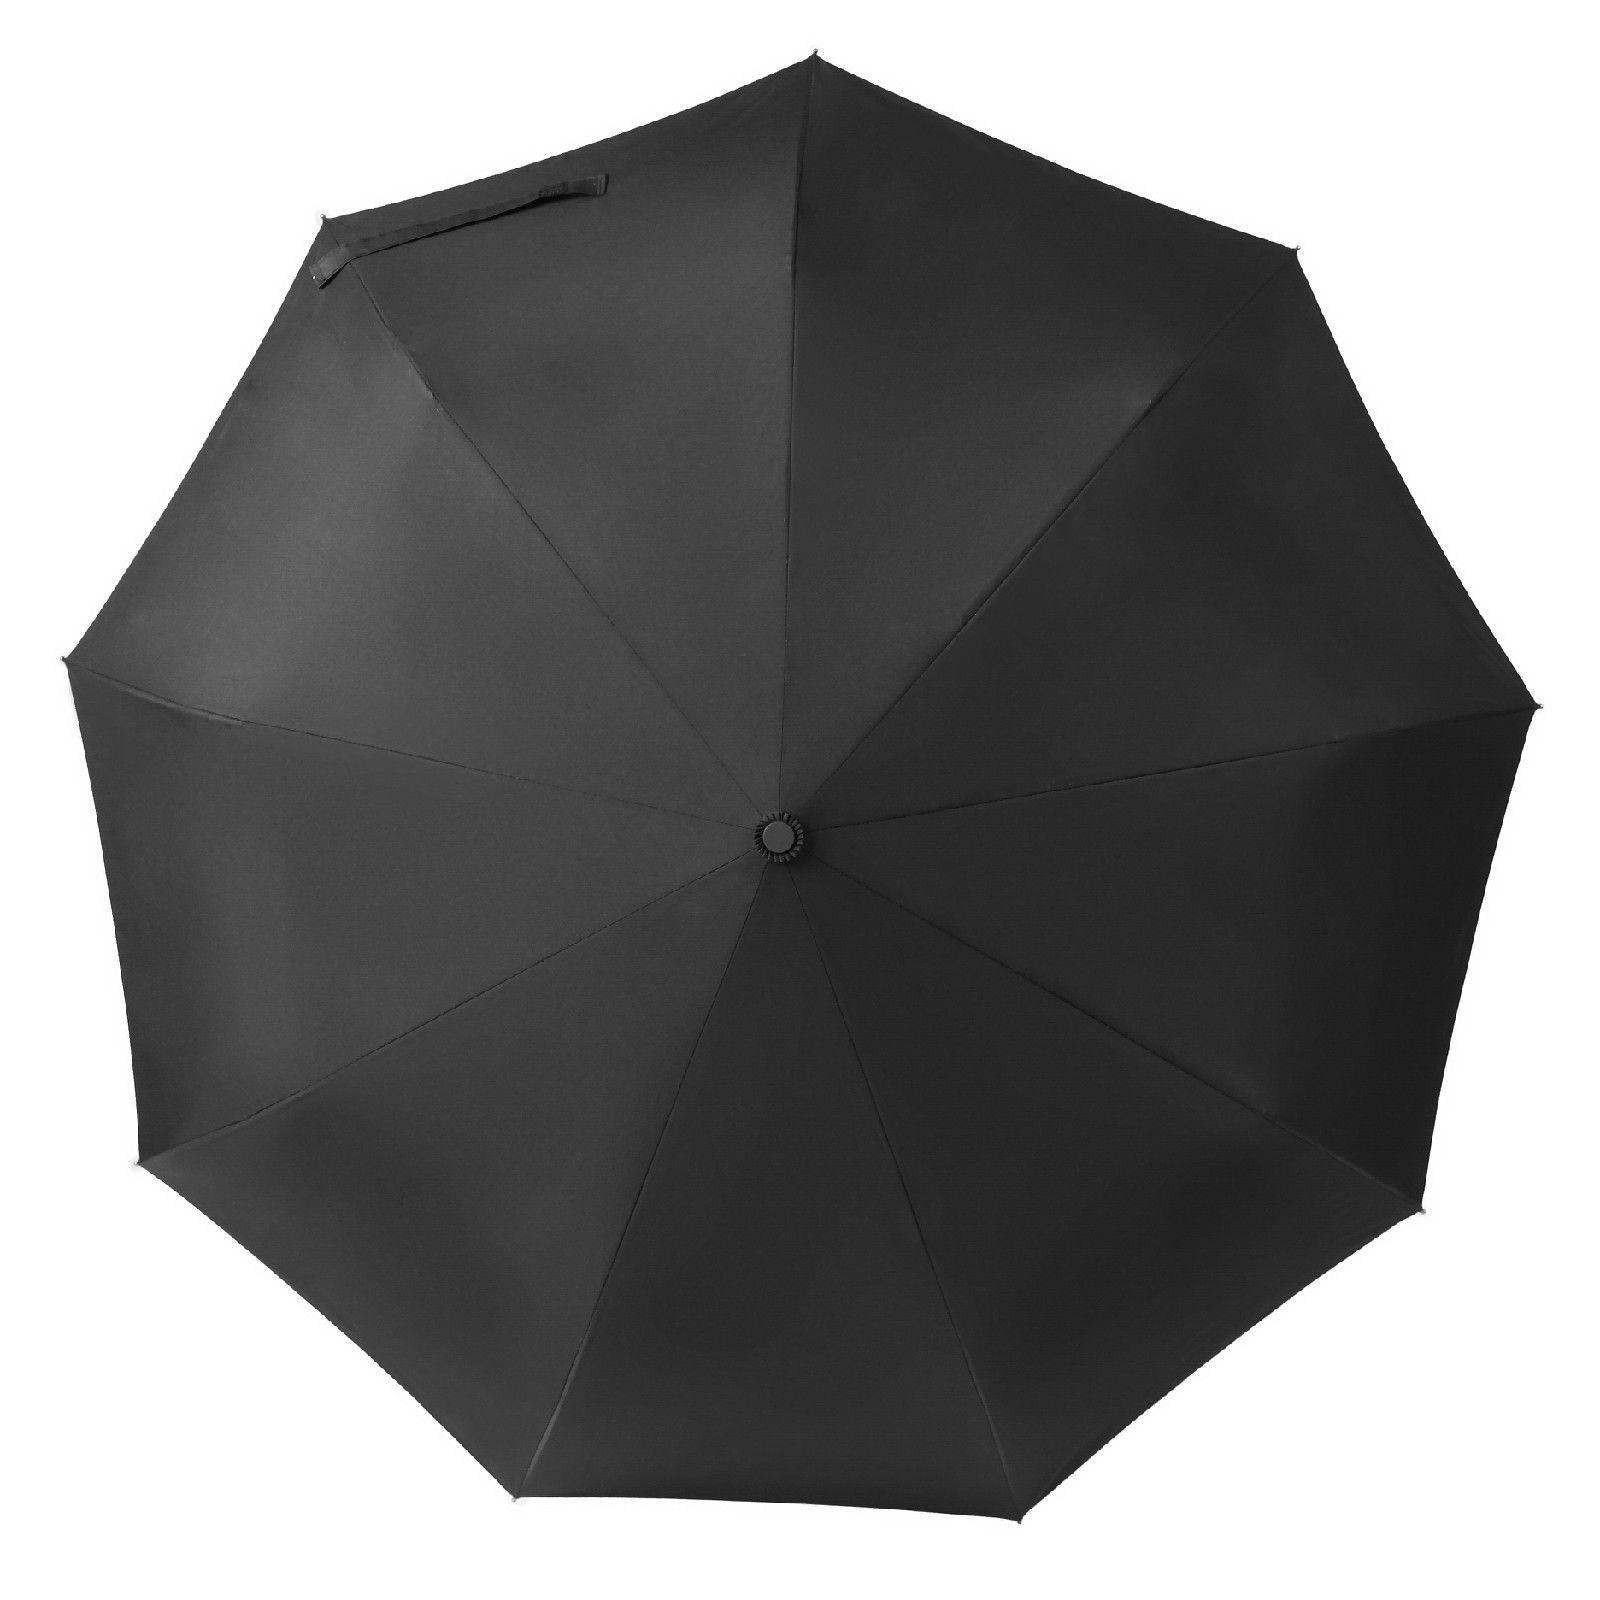 Bagail Auto Travel Strong Windproof umbrellas